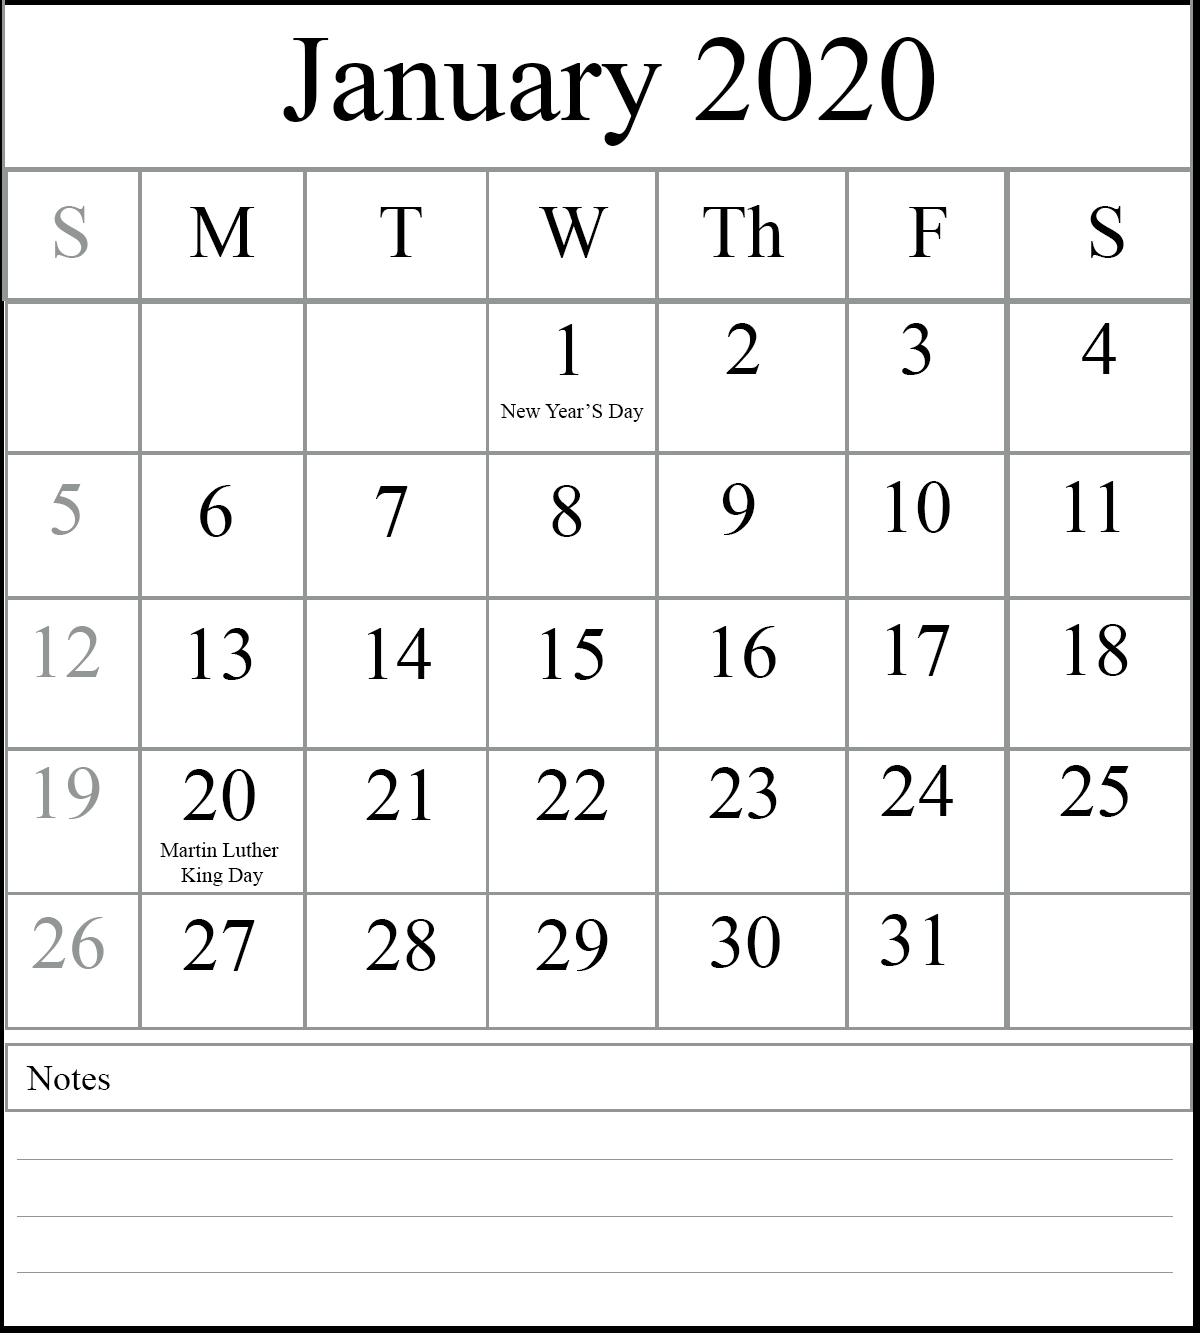 Blank January And February 2020 Calendar Printable Templates-Blank I 9 Form 2020 Printable